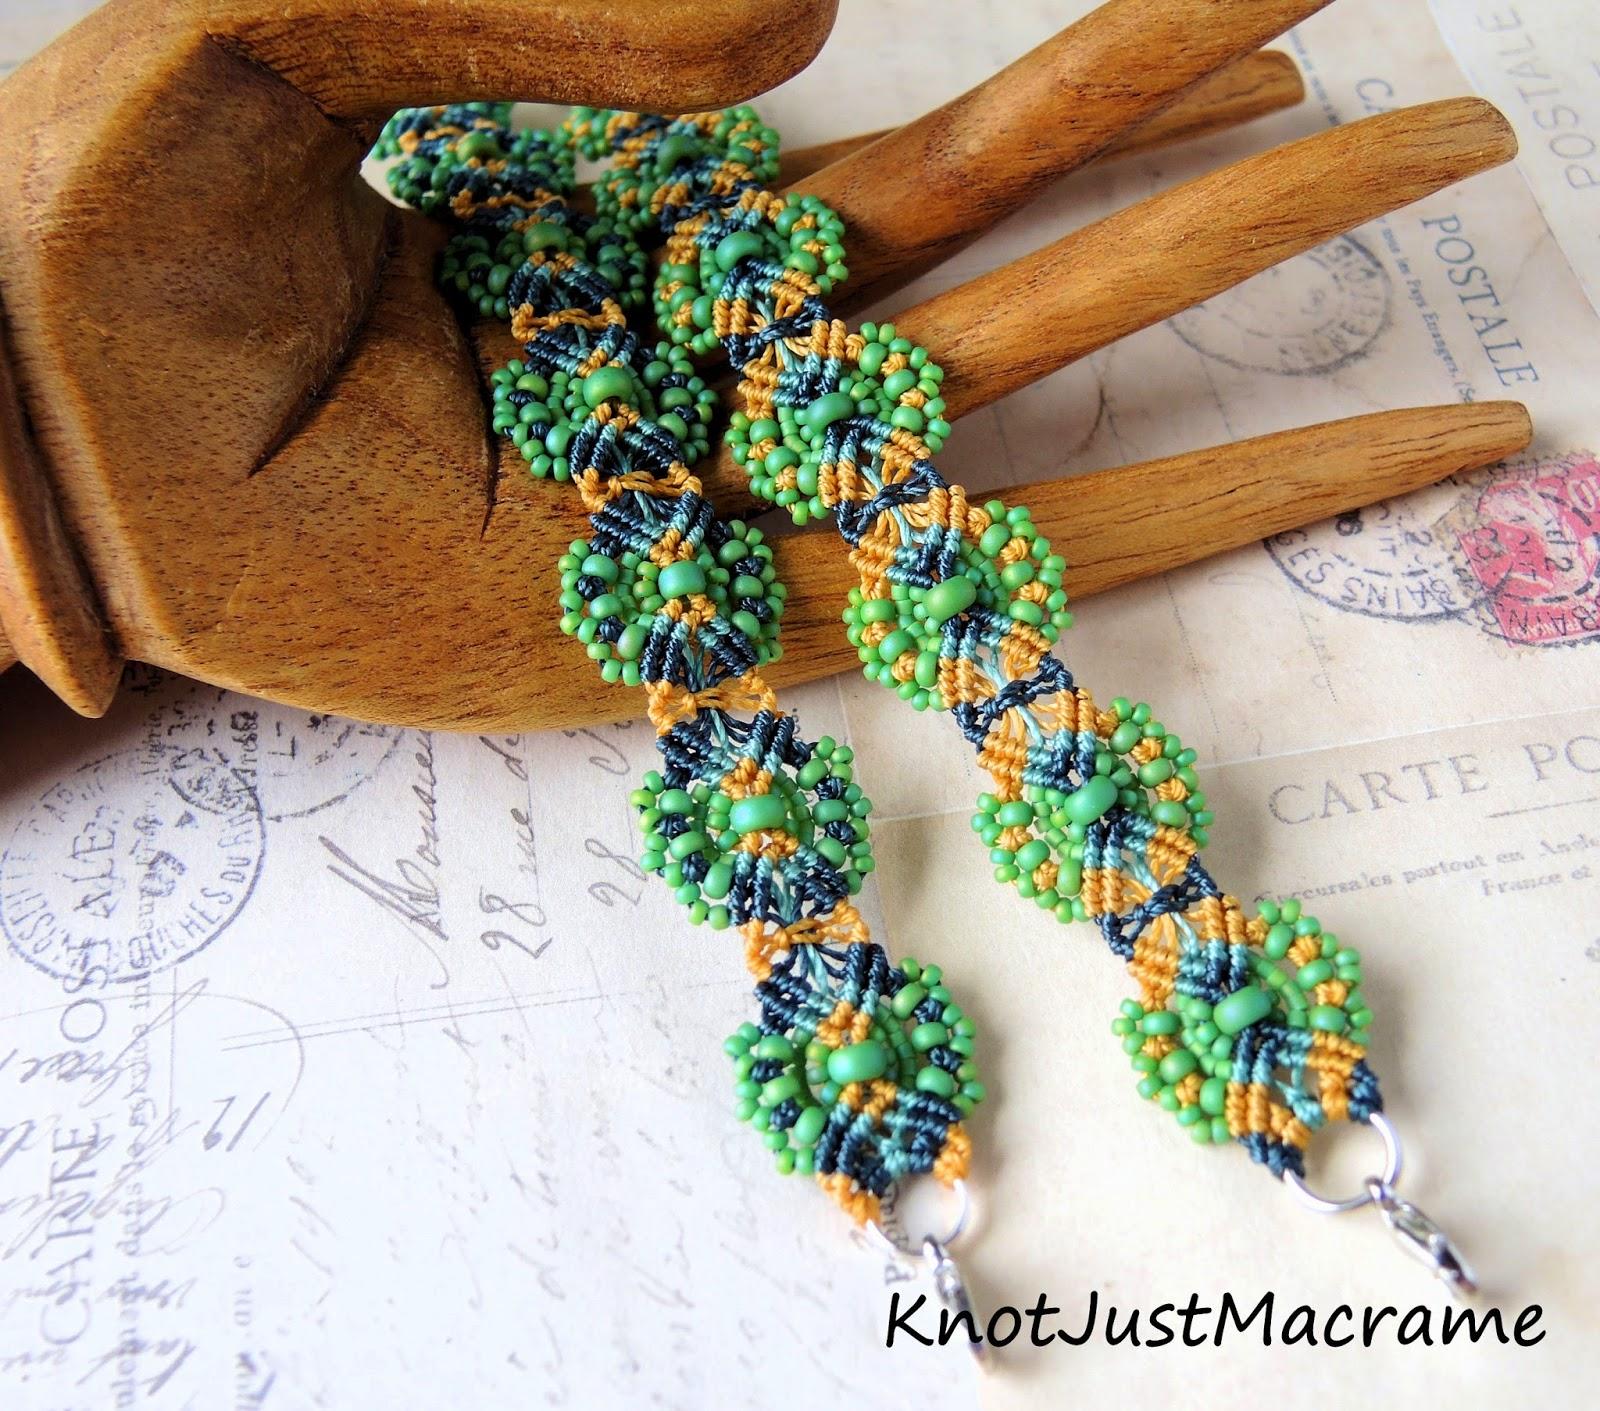 Knotted micro macrame bracelets by Sherri Stokey of Knot Just Macrame.